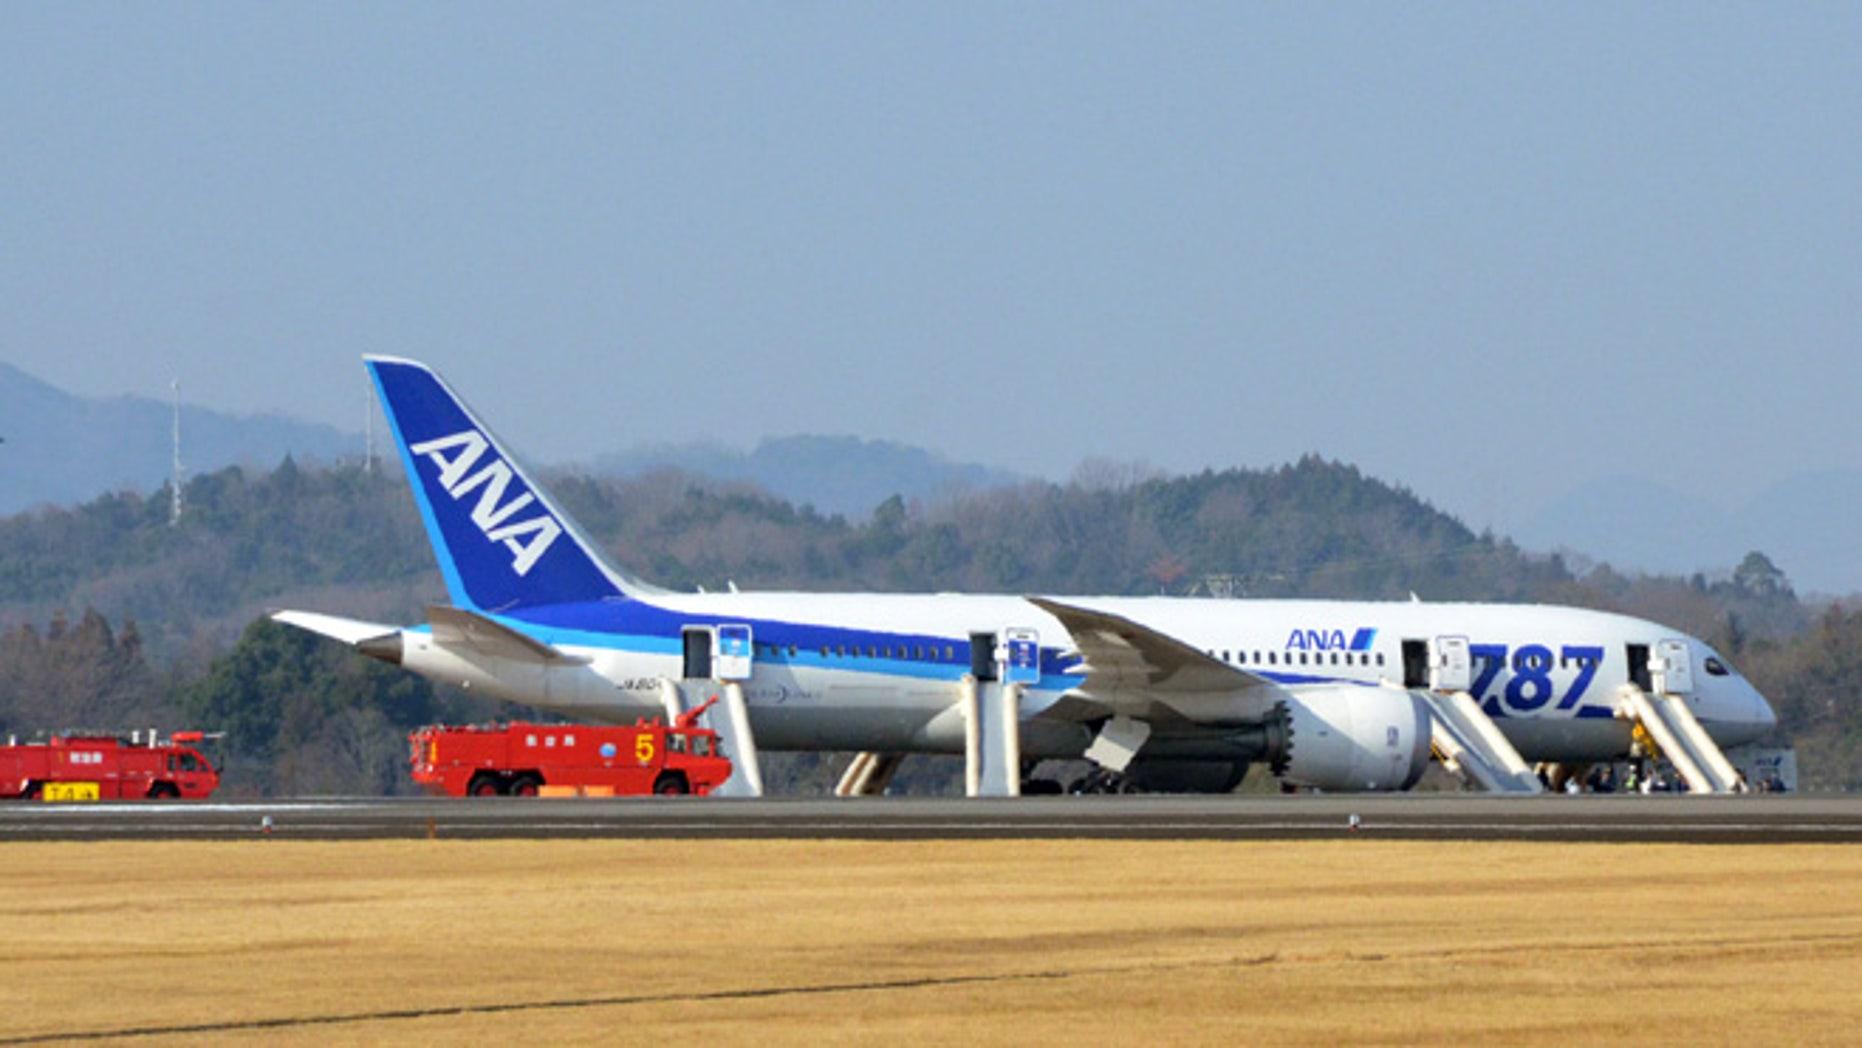 Jan. 16, 2013: An All Nippon Airways flight sits at Takamatsu airport in Takamatsu, western Japan after it made an emergency landing.